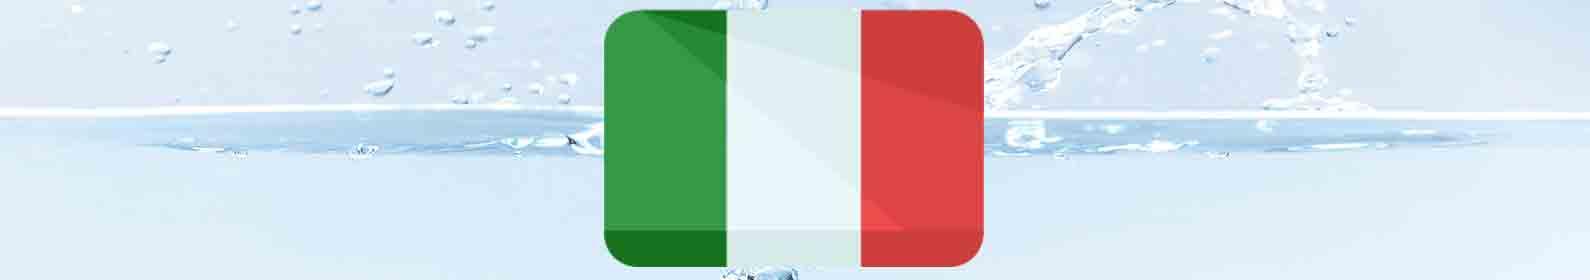 tratamento-de-agua-italia.jpg